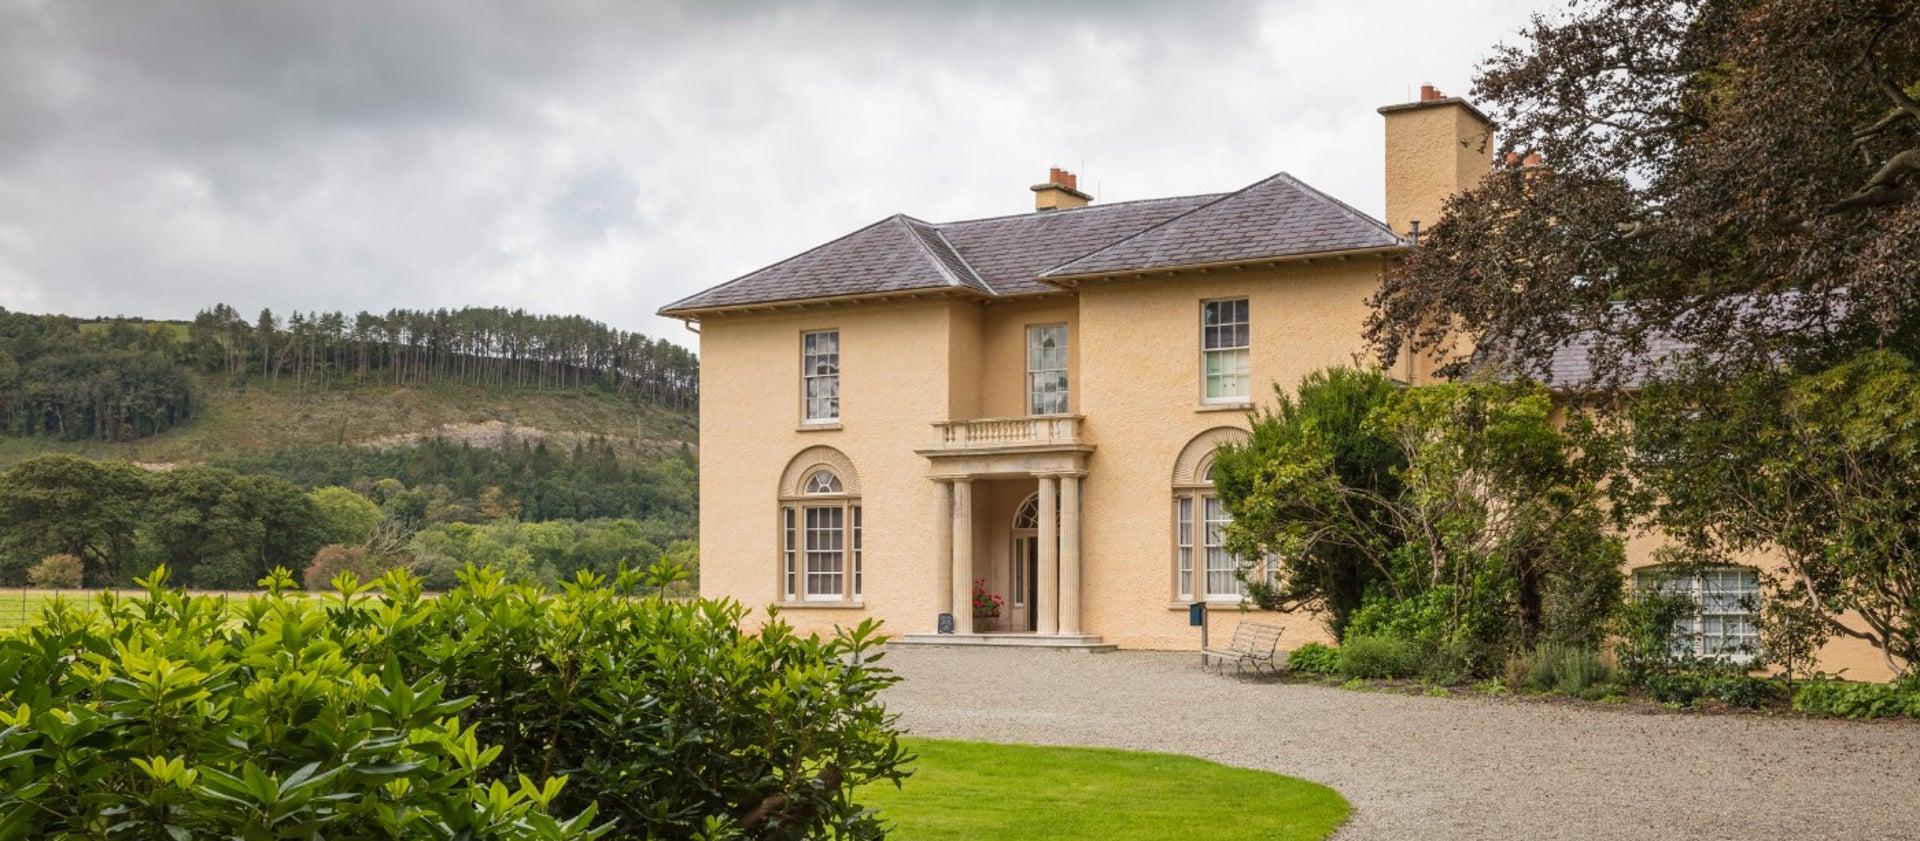 National Trust Llanerchaeron